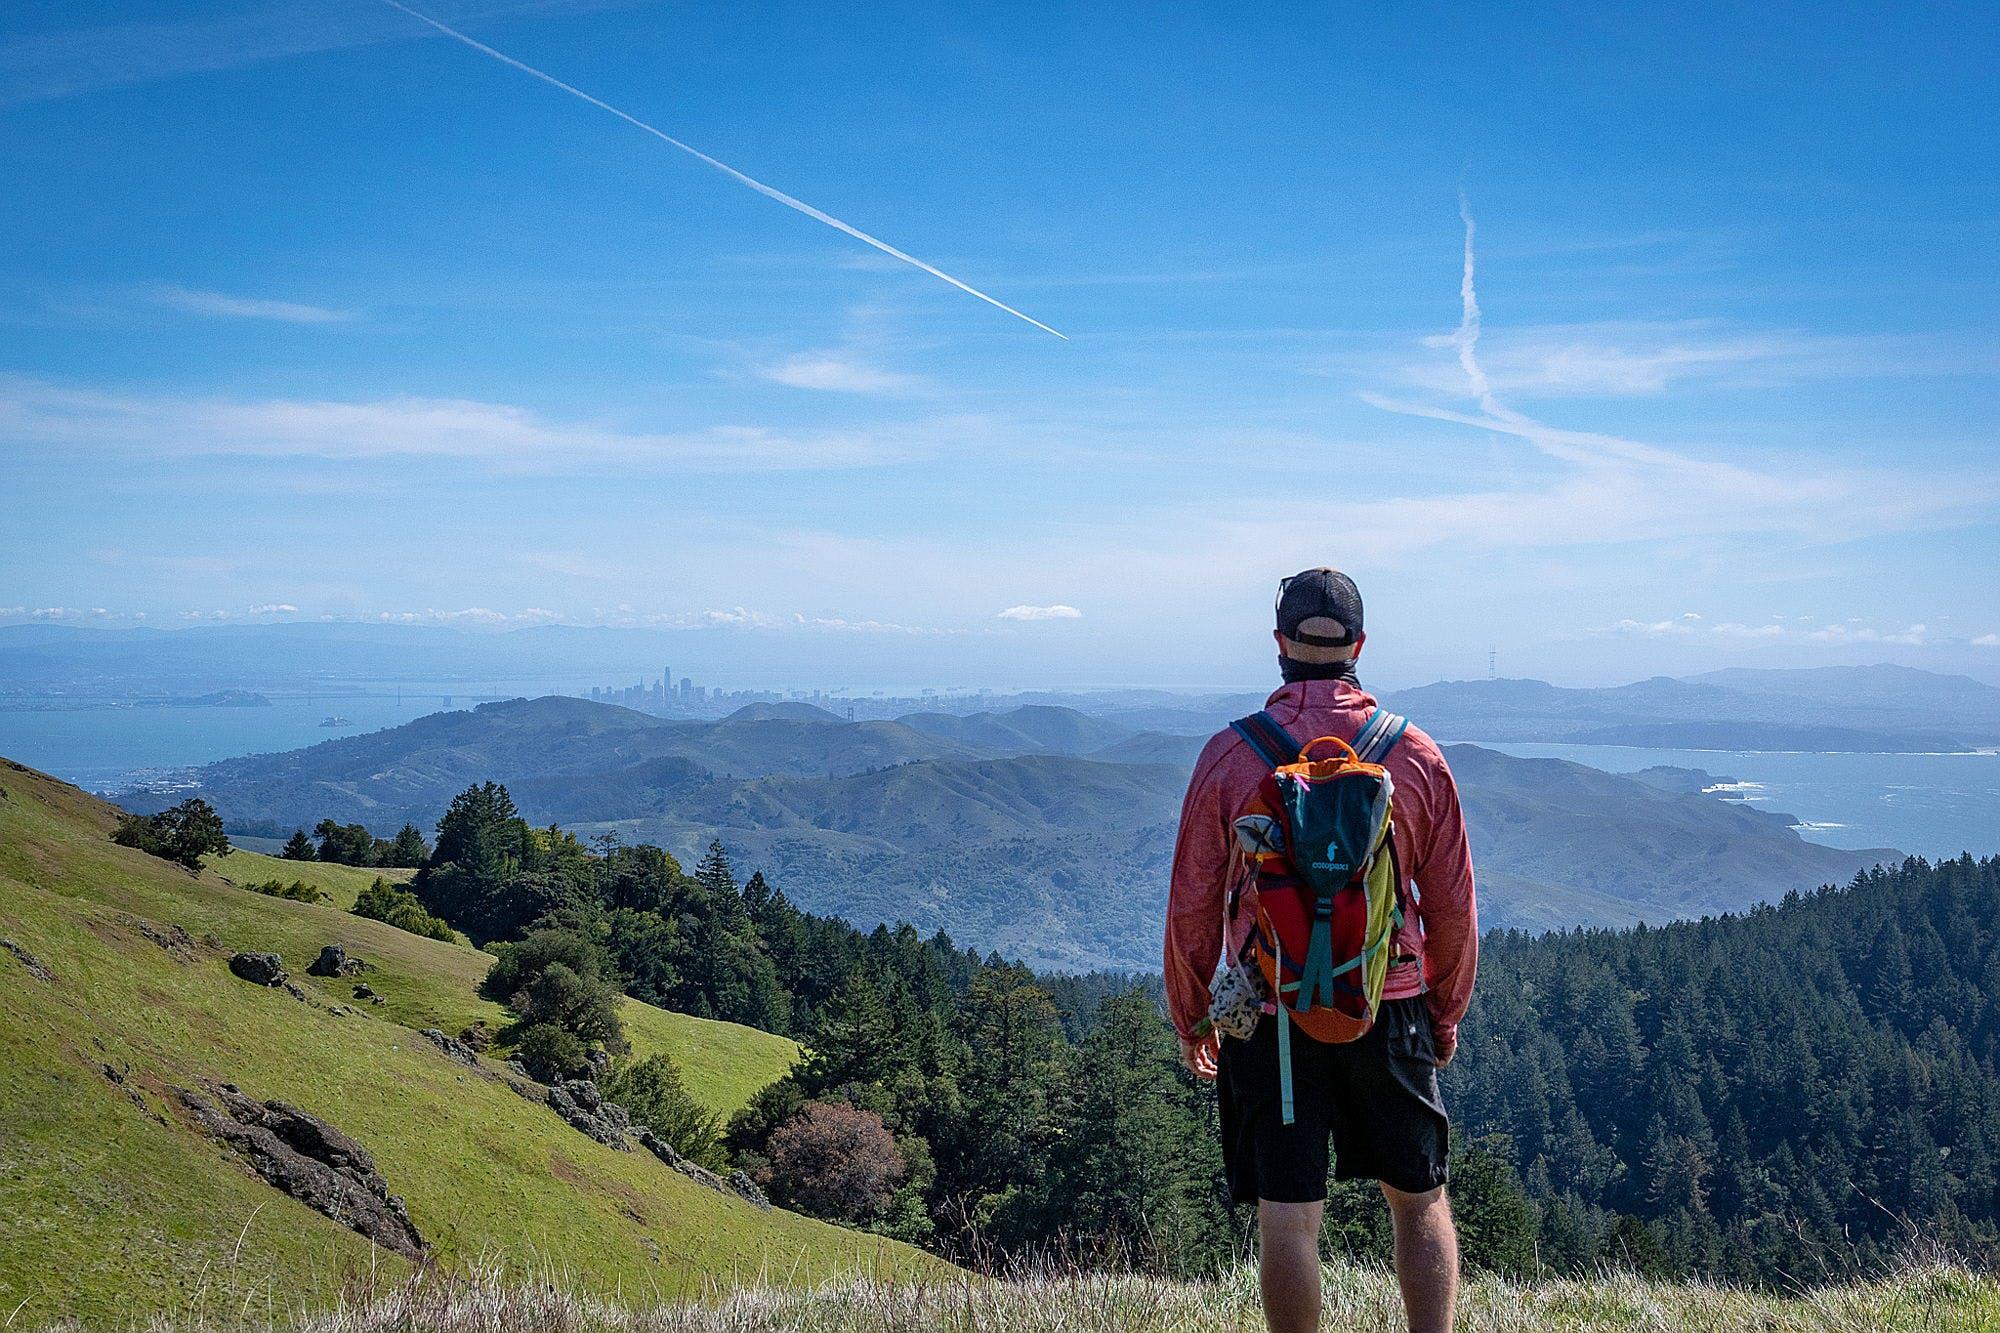 Man standing at Mount Tam vantage overlooking the San Francisco skyline